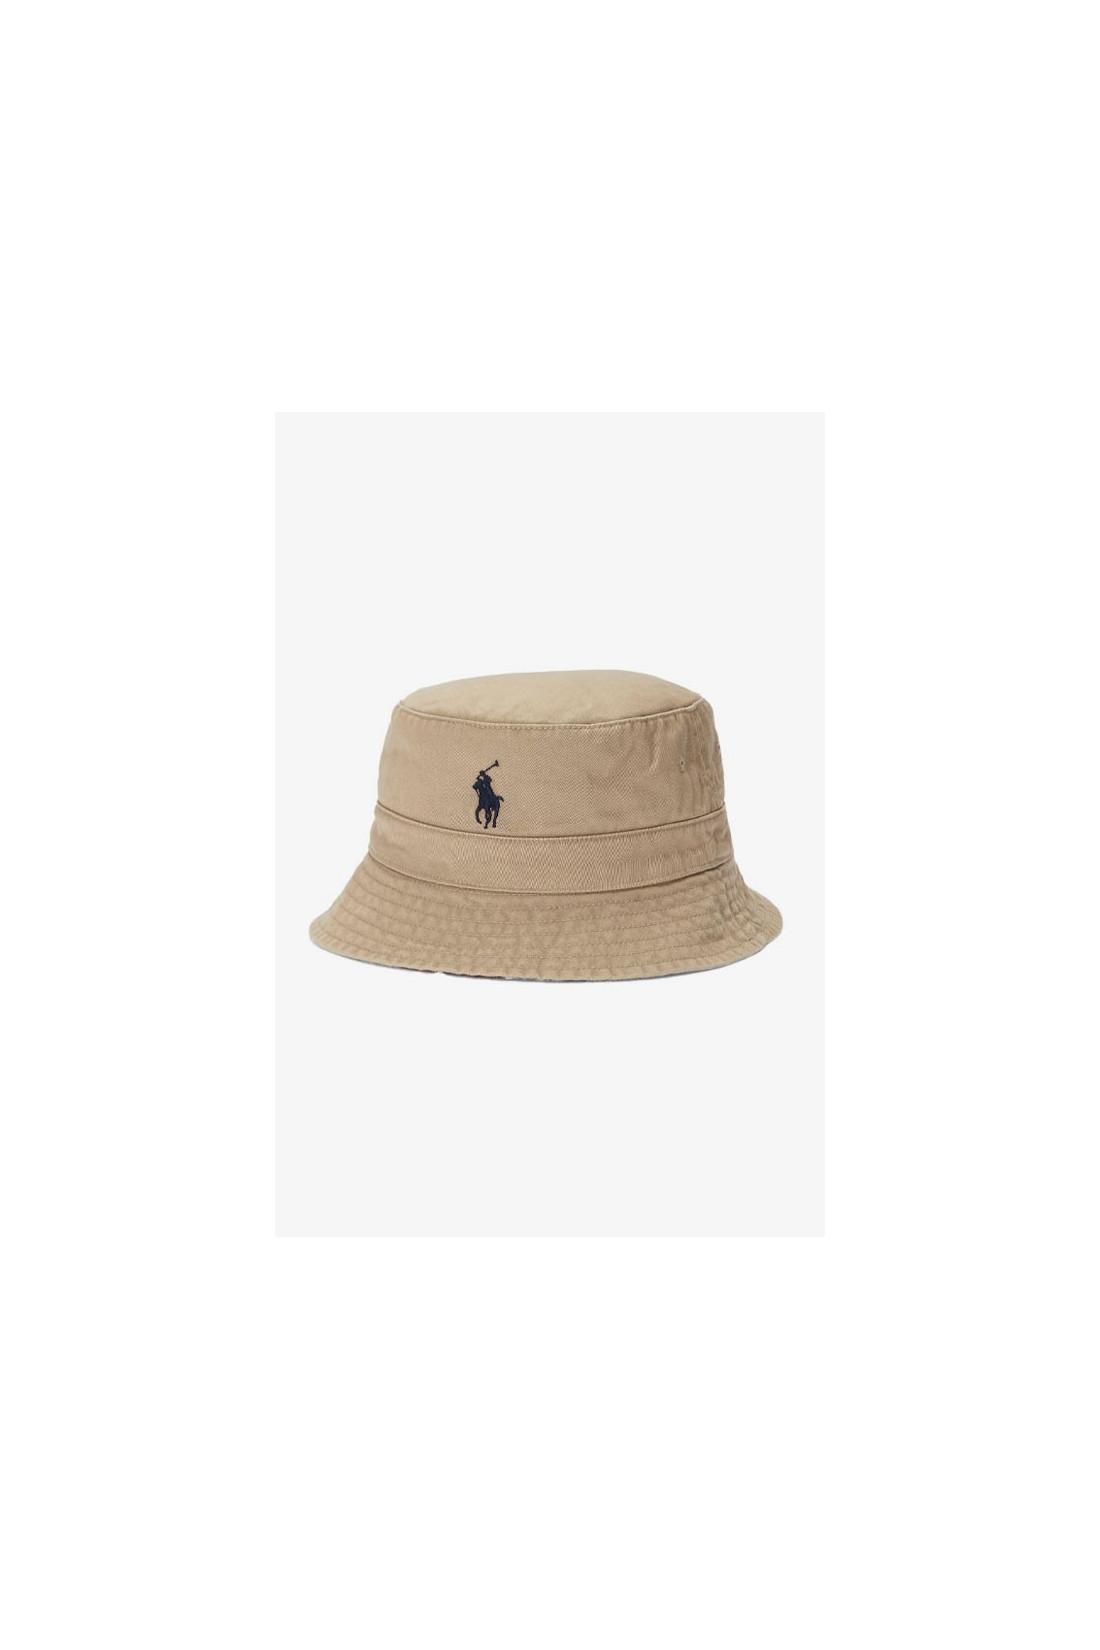 POLO RALPH LAUREN / Loft bucket hat reversible Mutli/tan